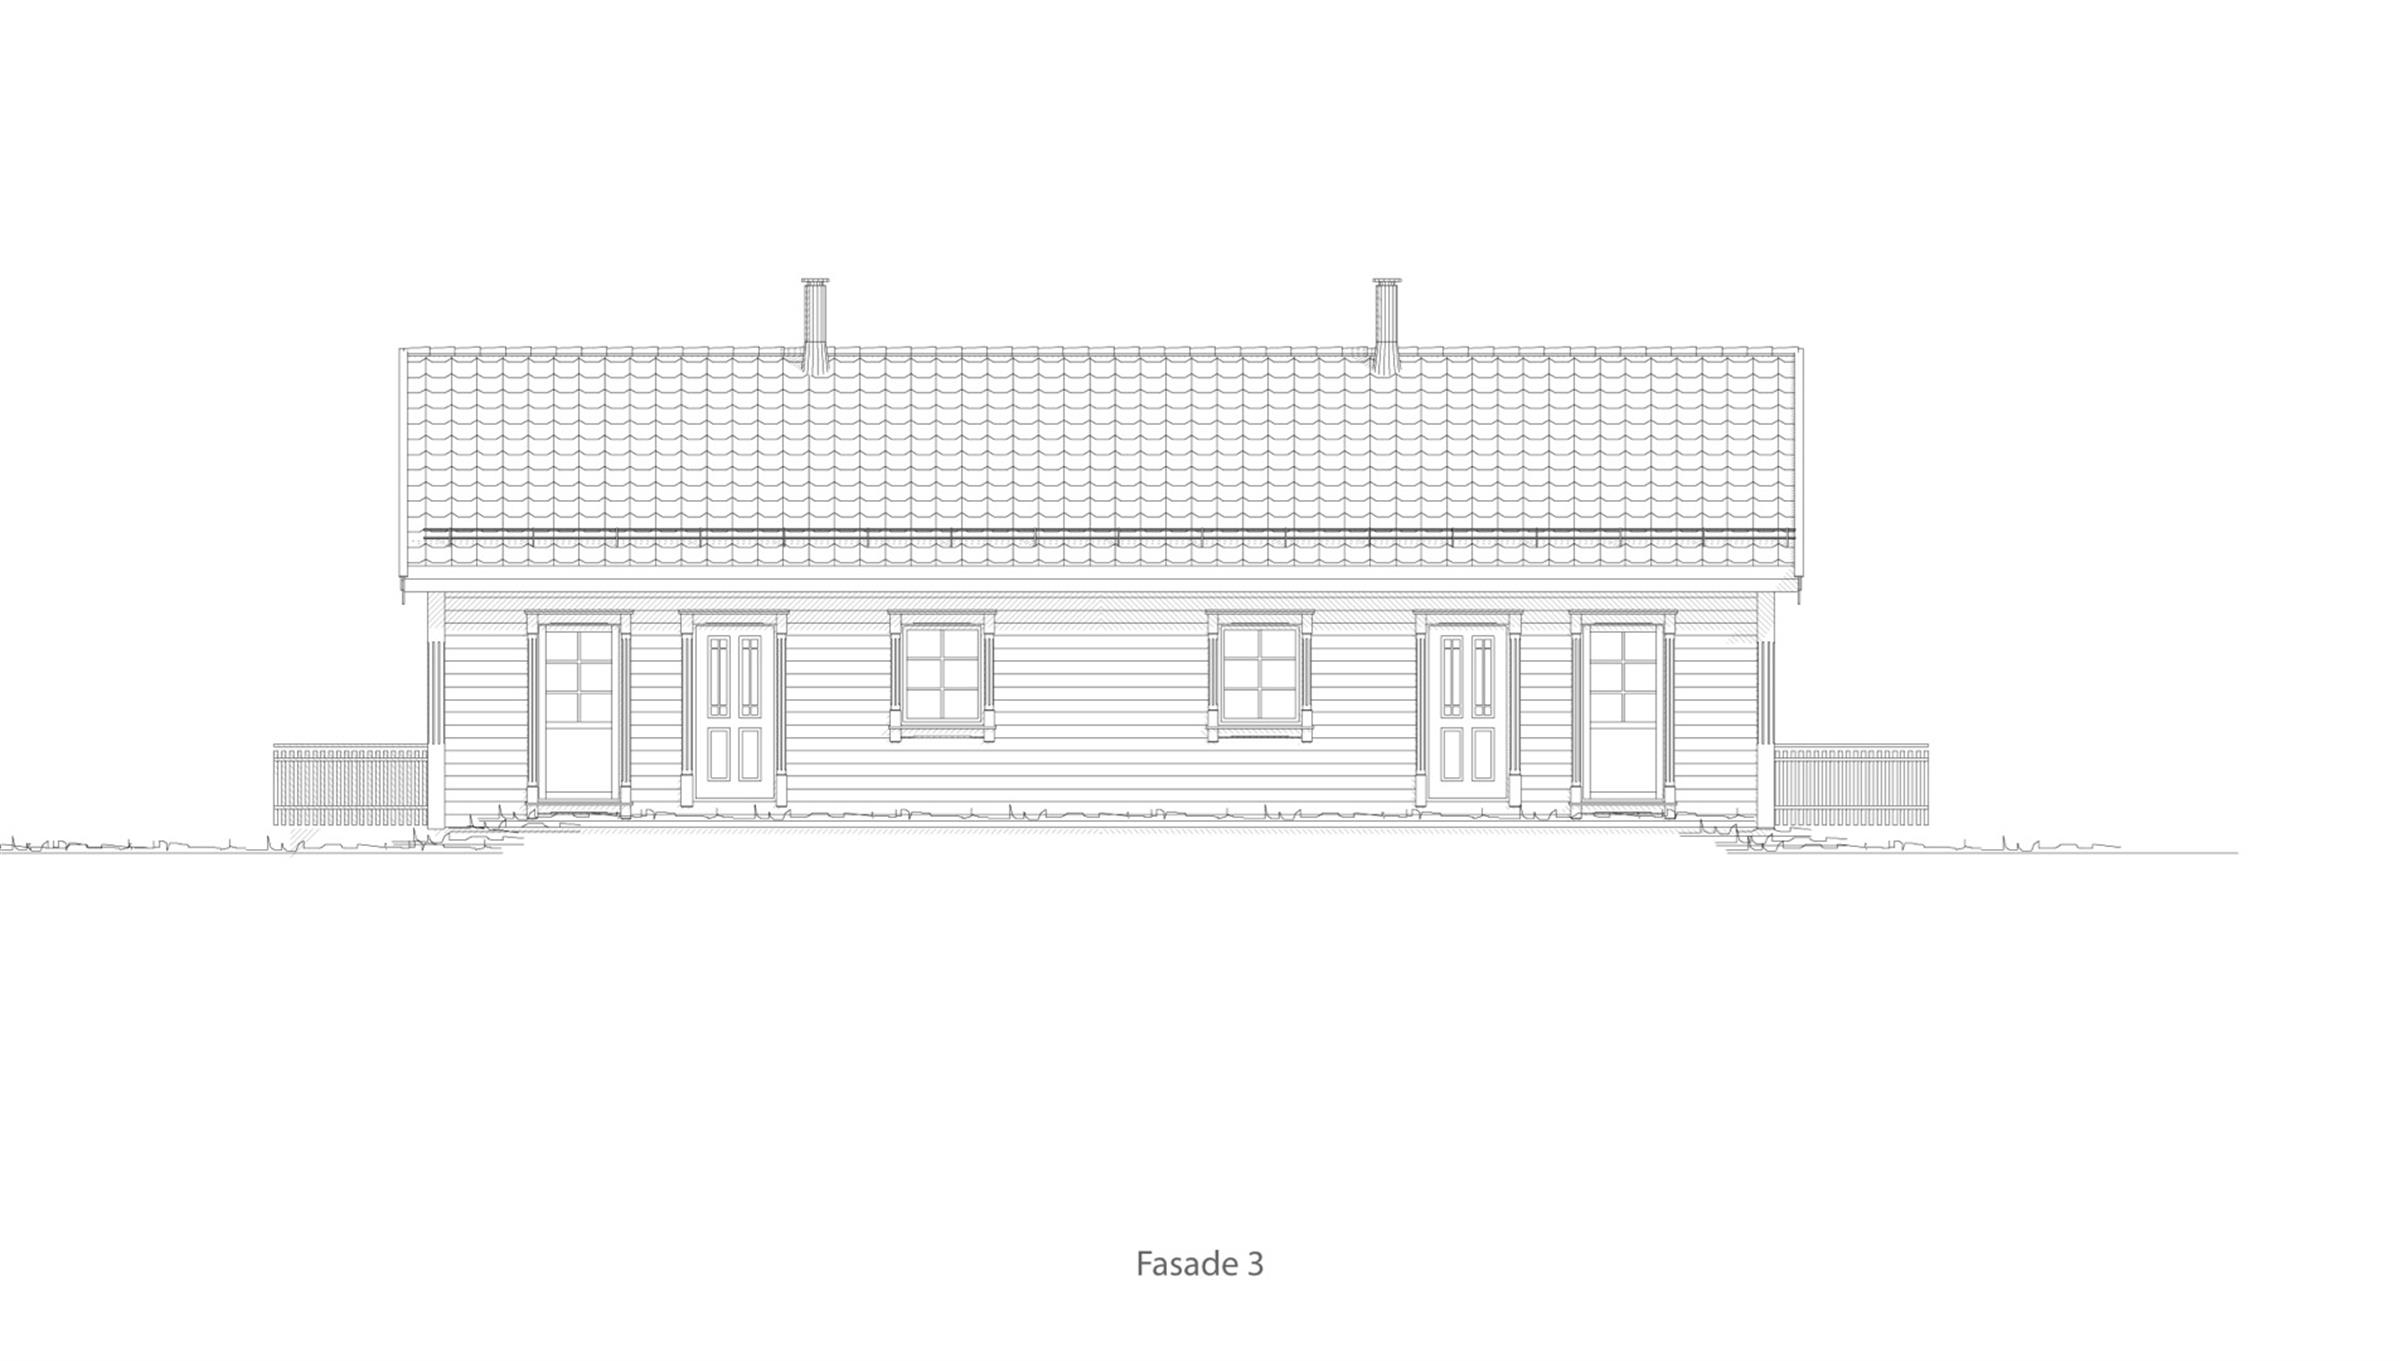 Sortland fasade 3